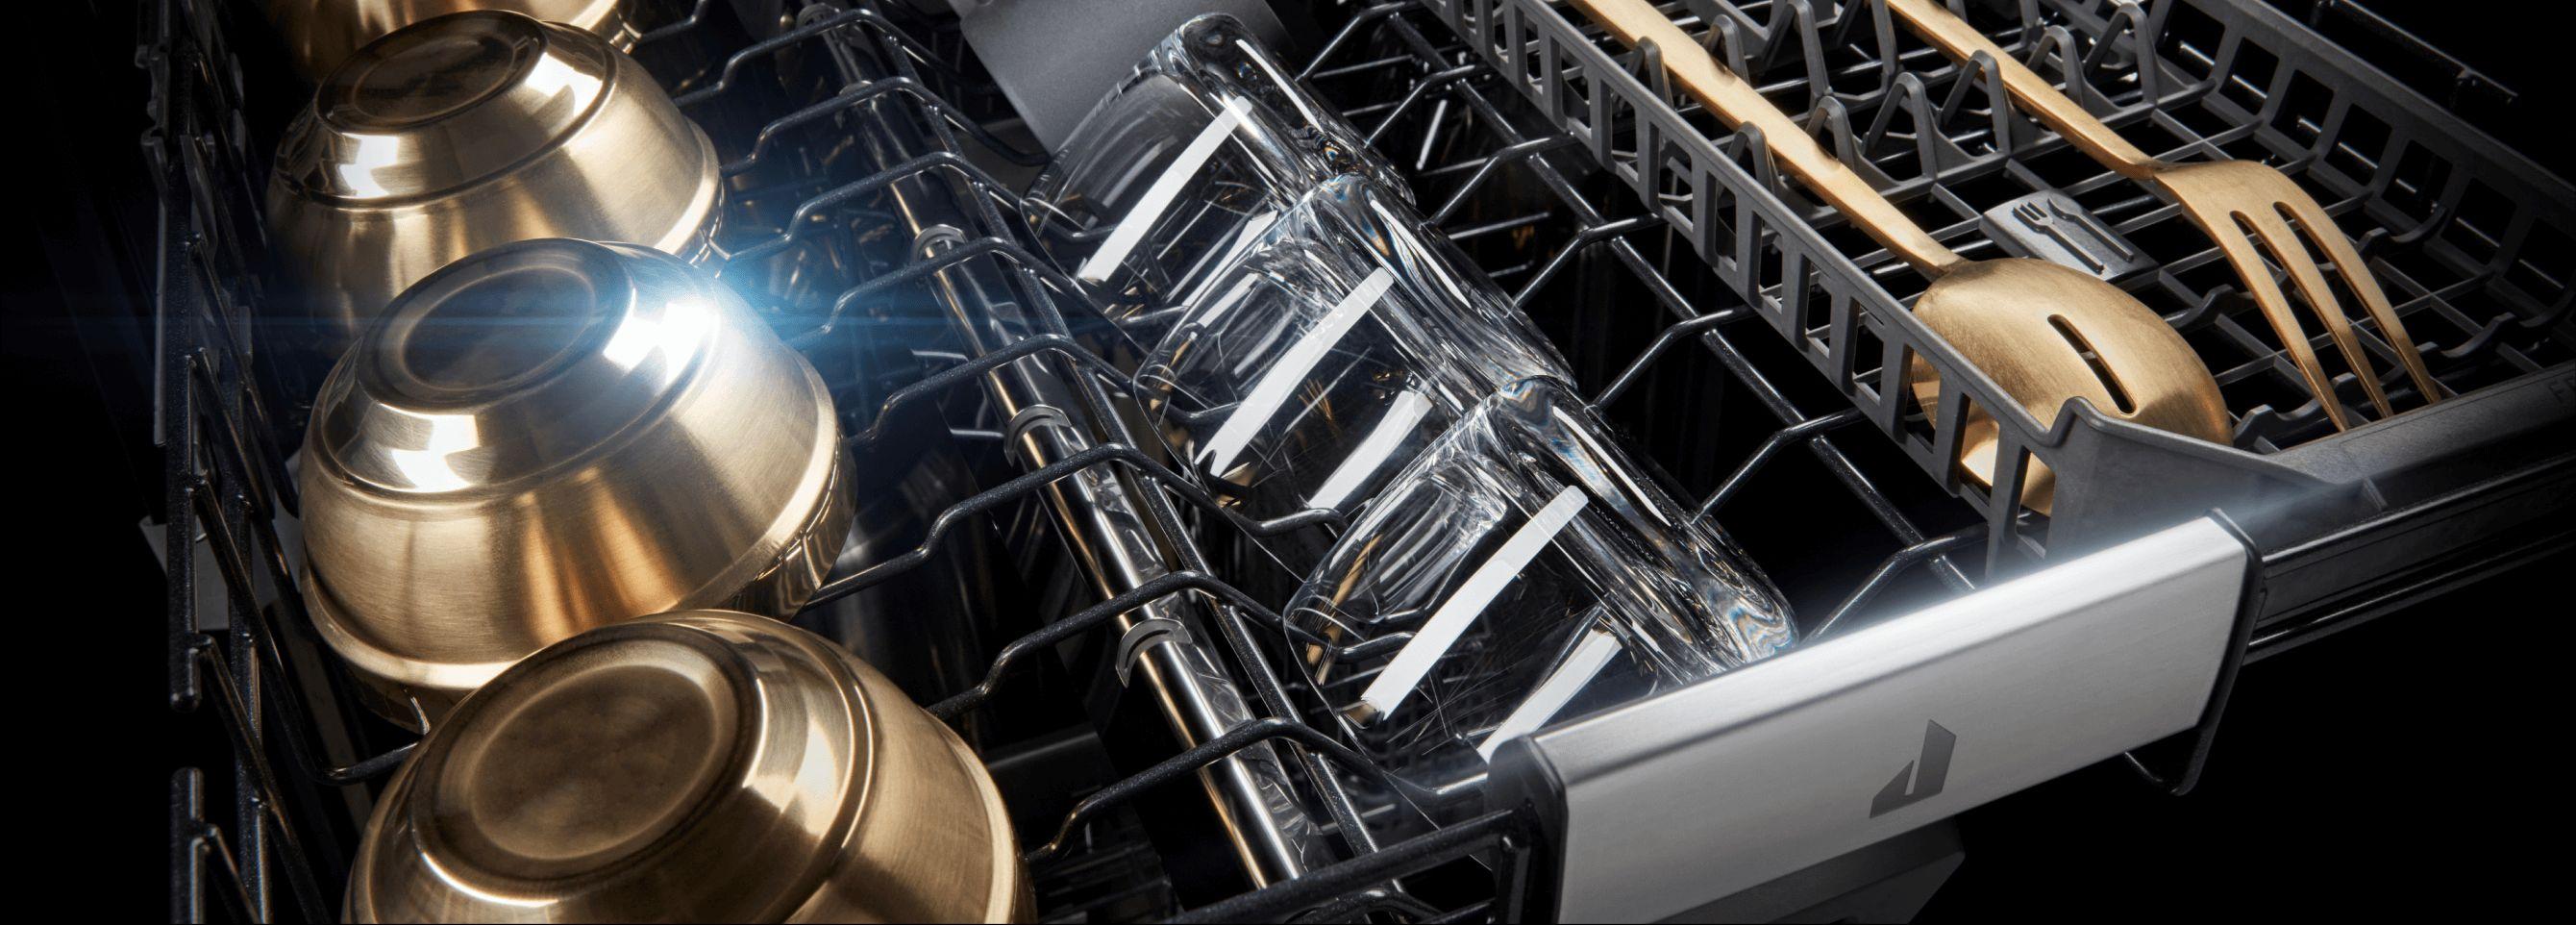 The high-capacity rack inside a JennAir® dishwasher